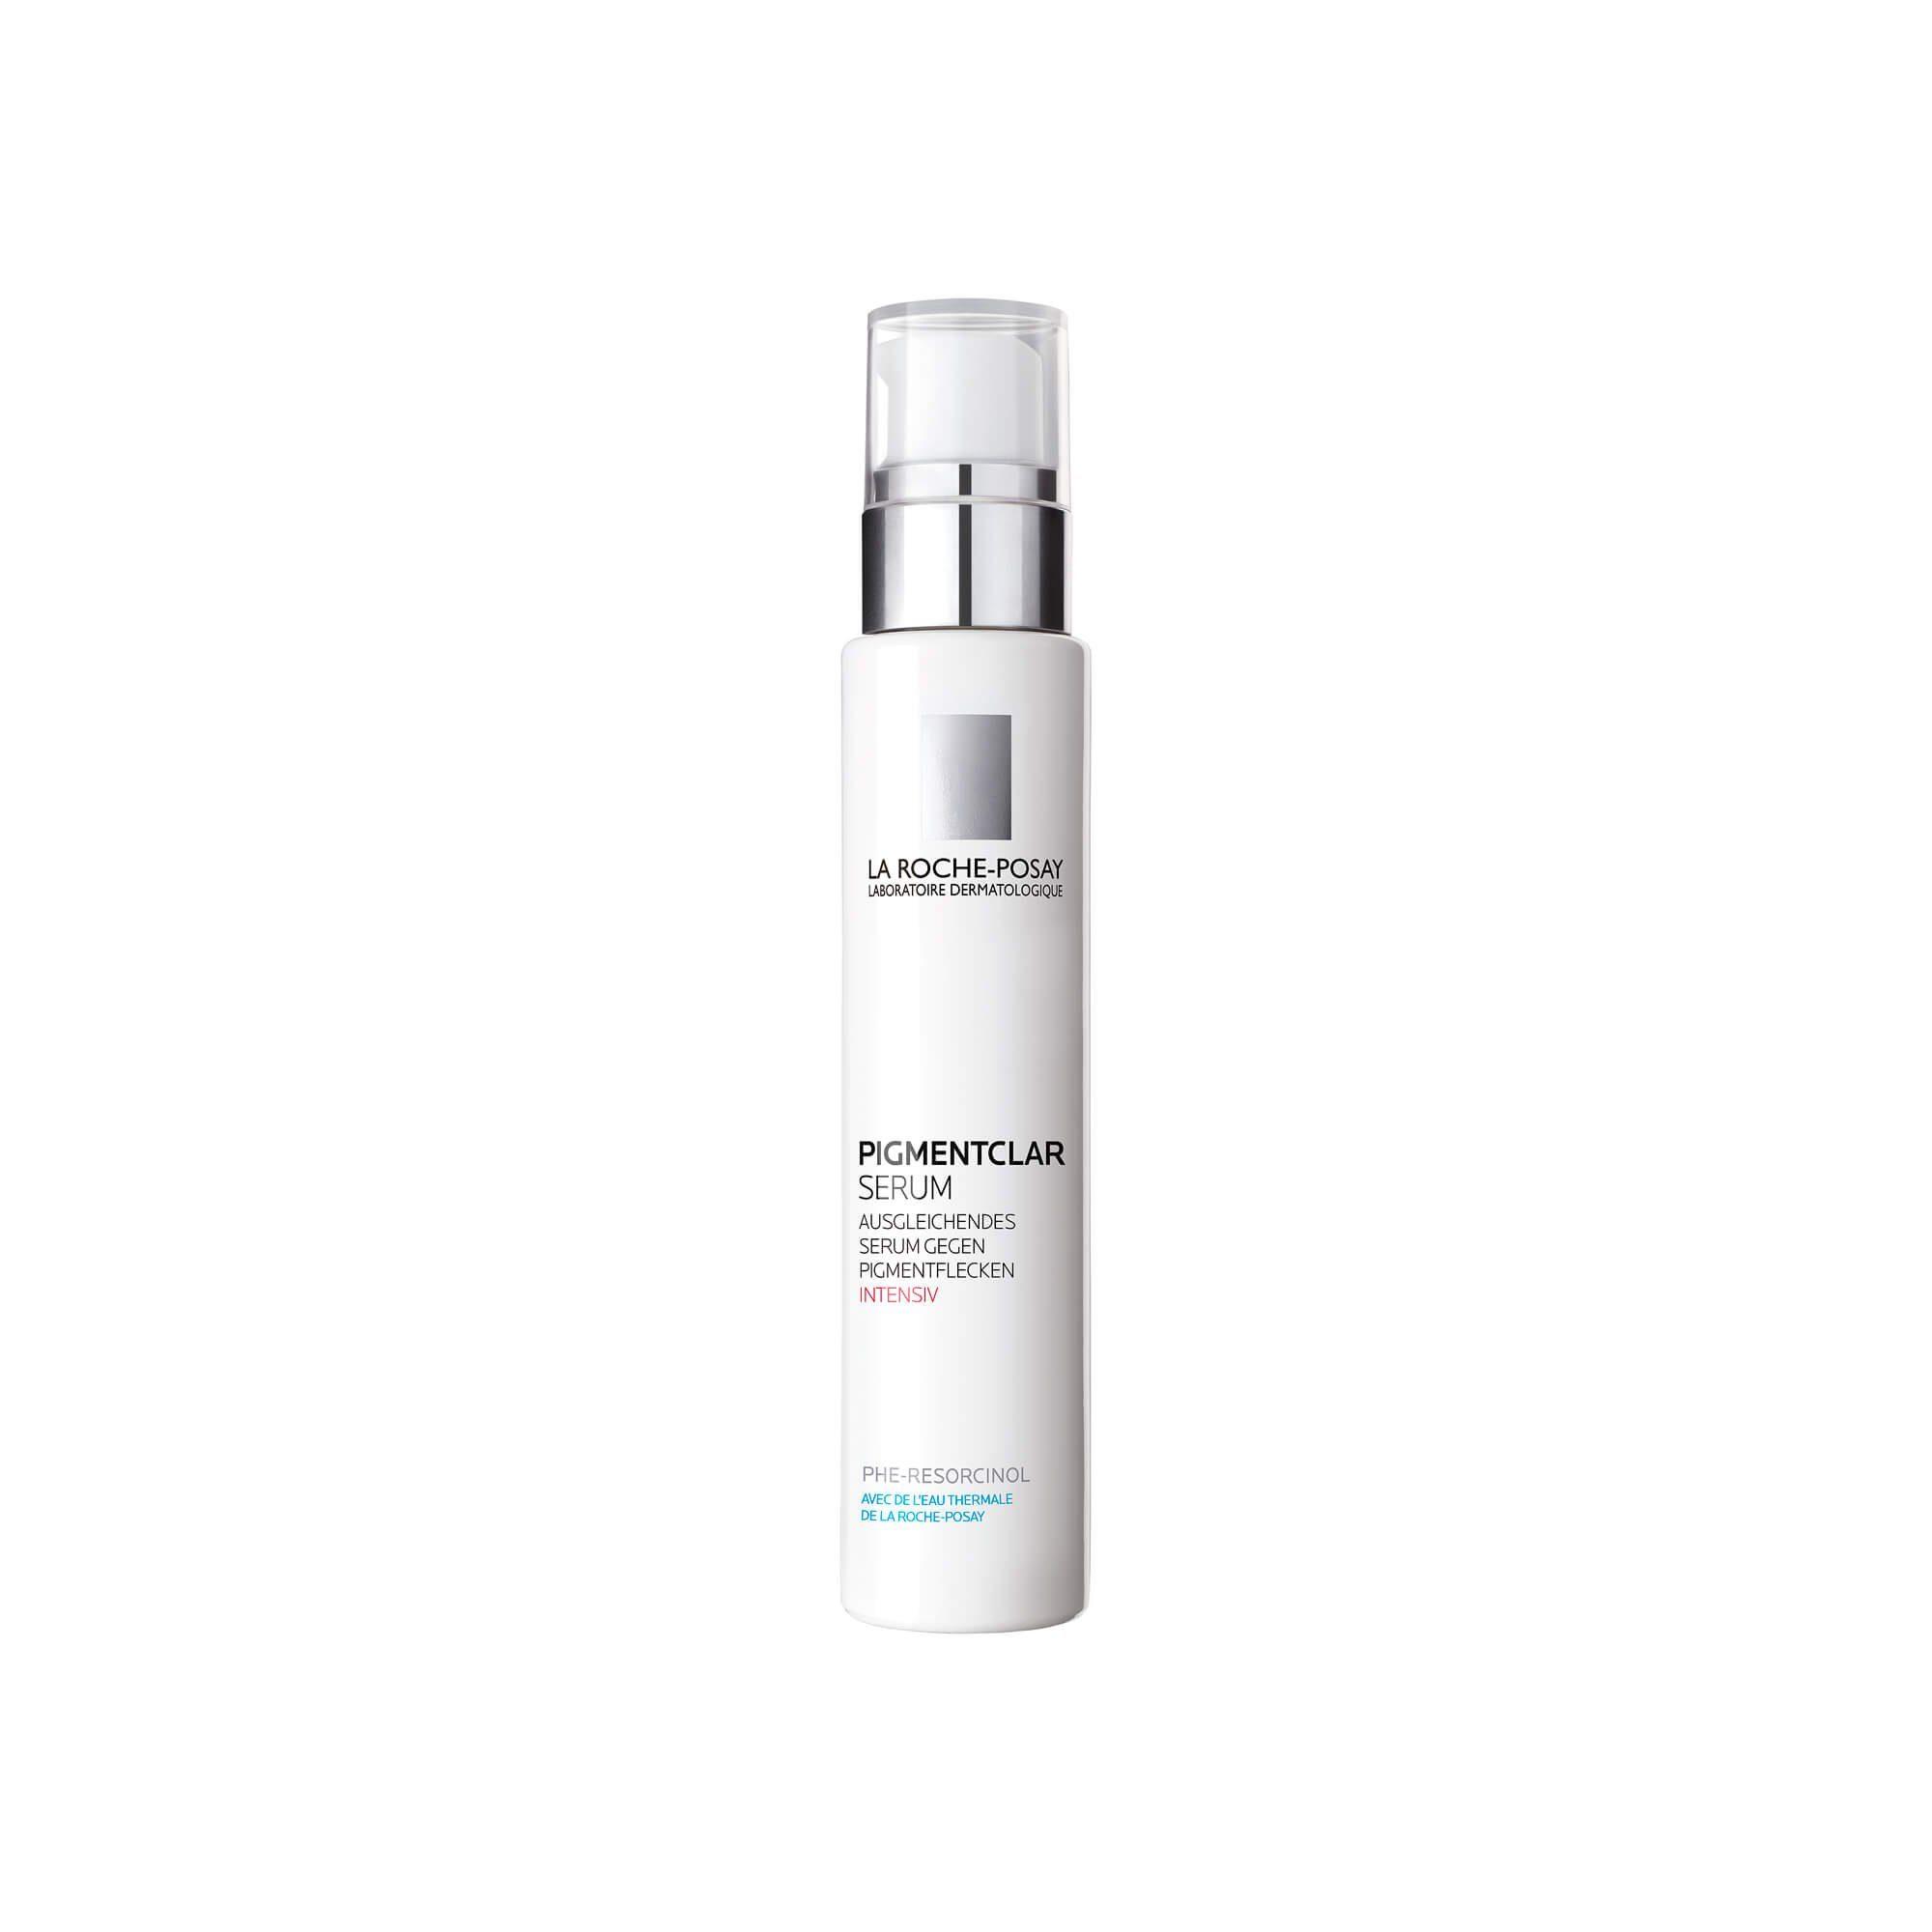 Roche Posay Pigmentclar Serum, 30 ml